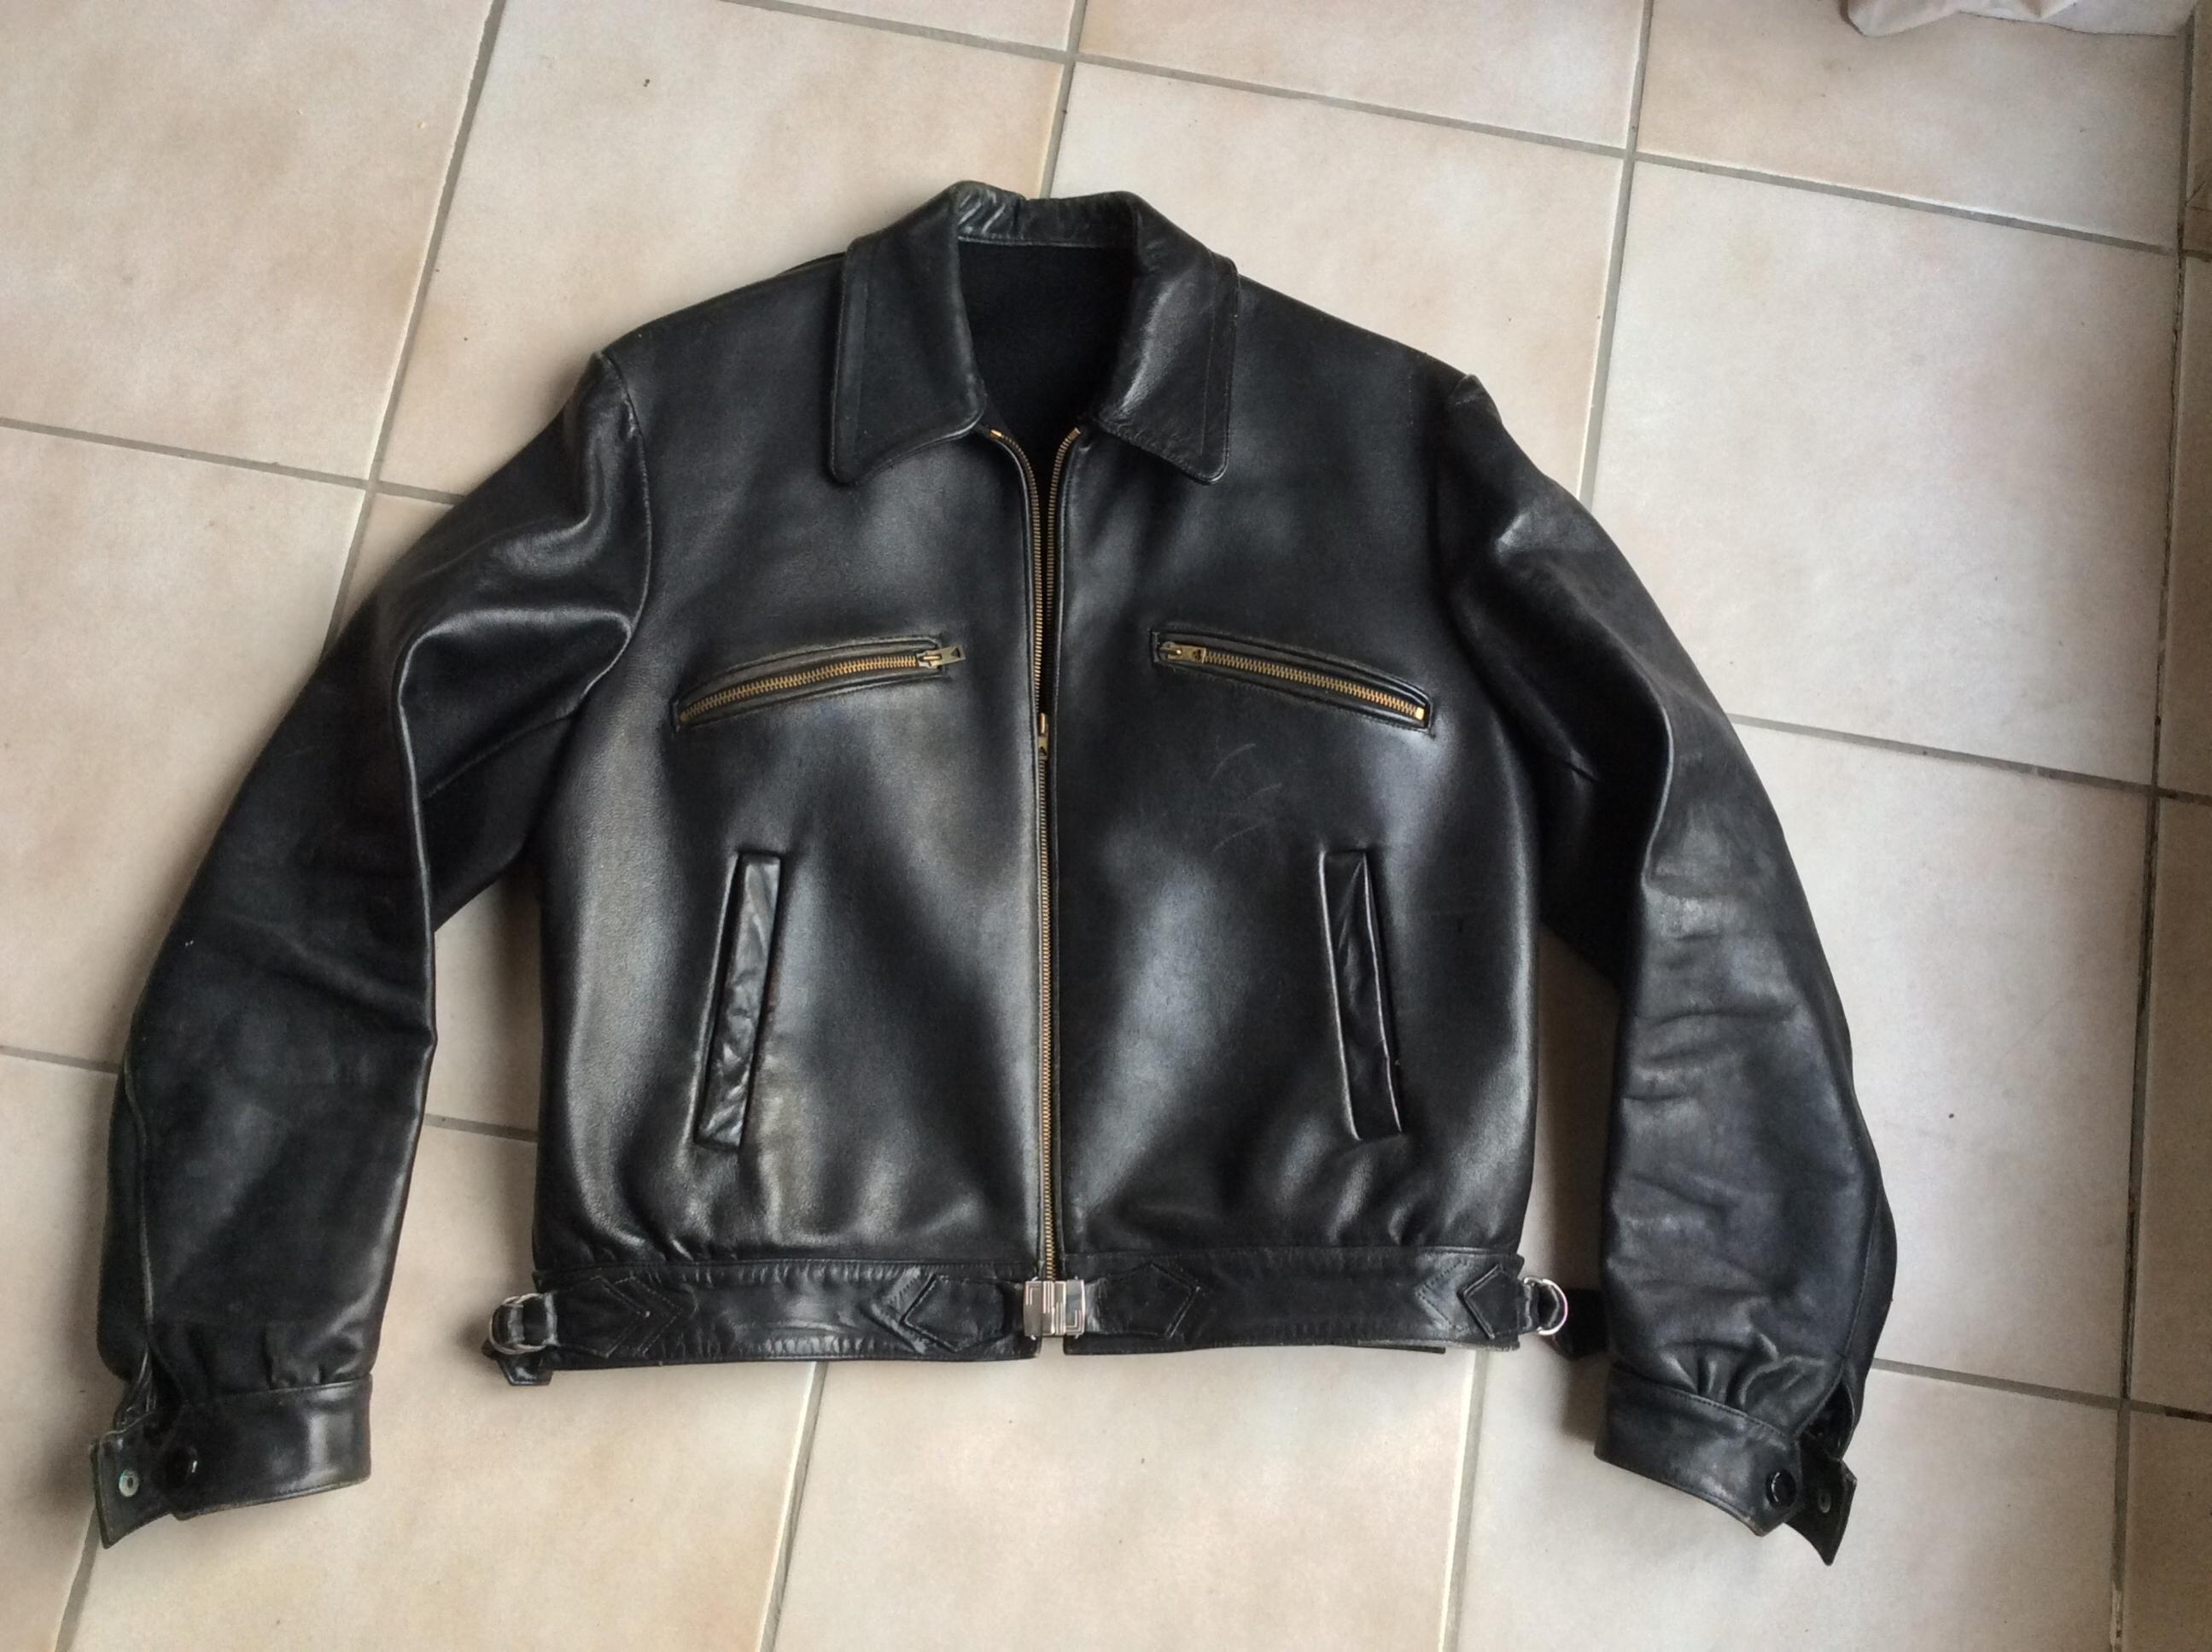 Albert Einstein's c1935 levisbrand leather jacket. On